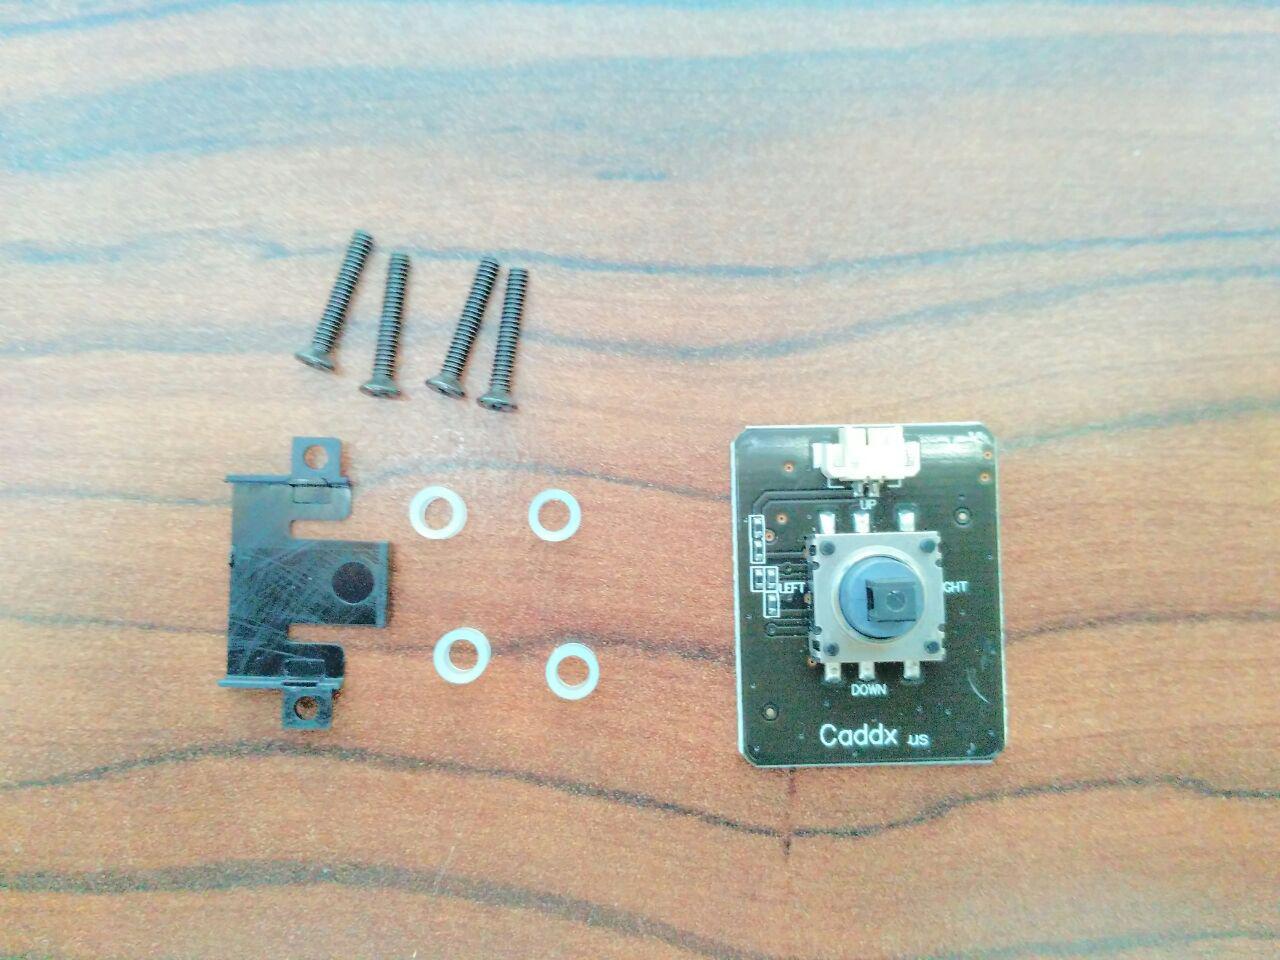 Caddx Tarsier 4K - FPV камера с топовым разрешением и двумя объективами